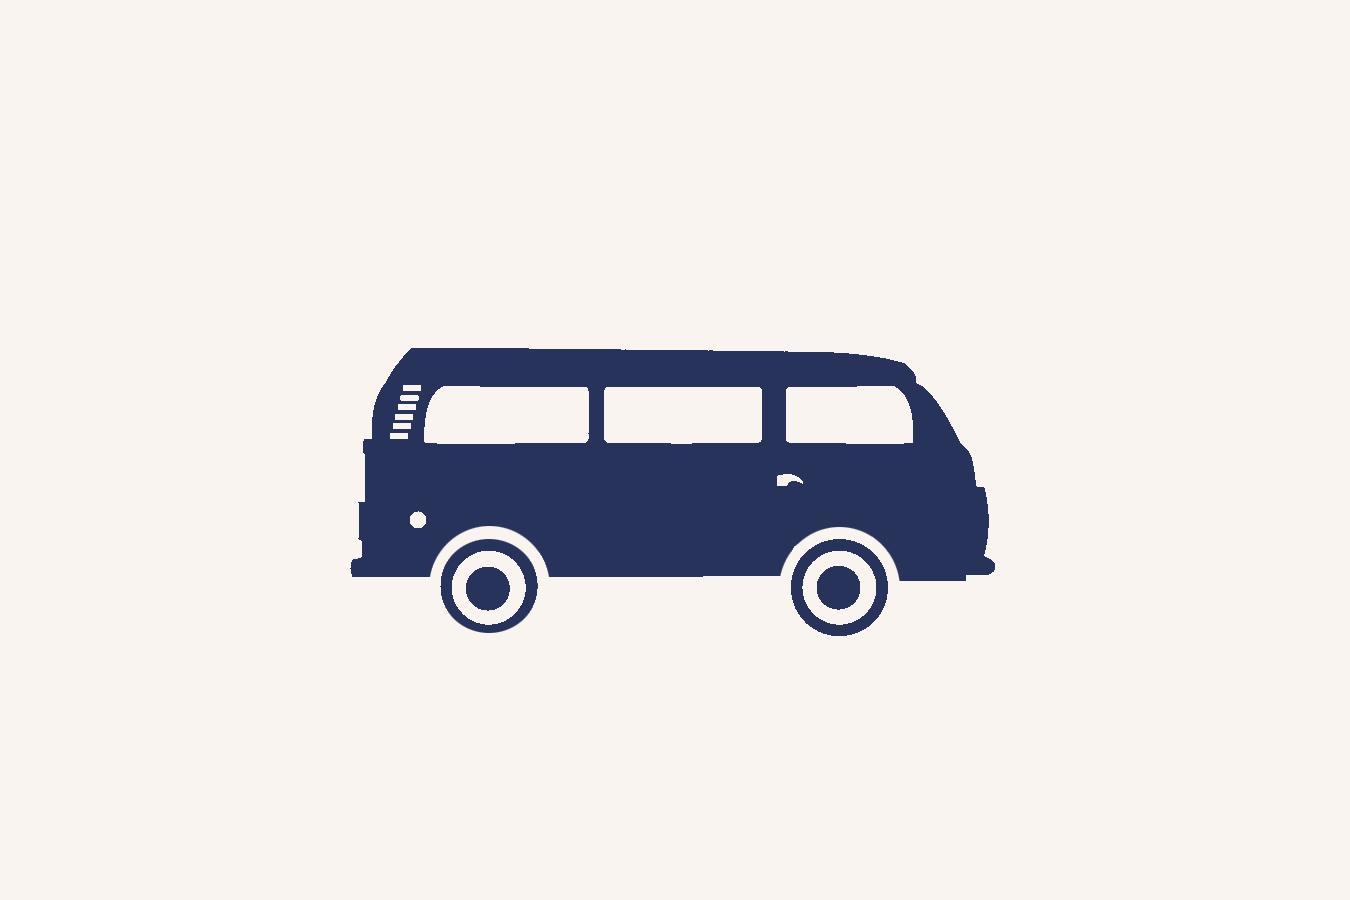 Wohnmobil (<5mt)